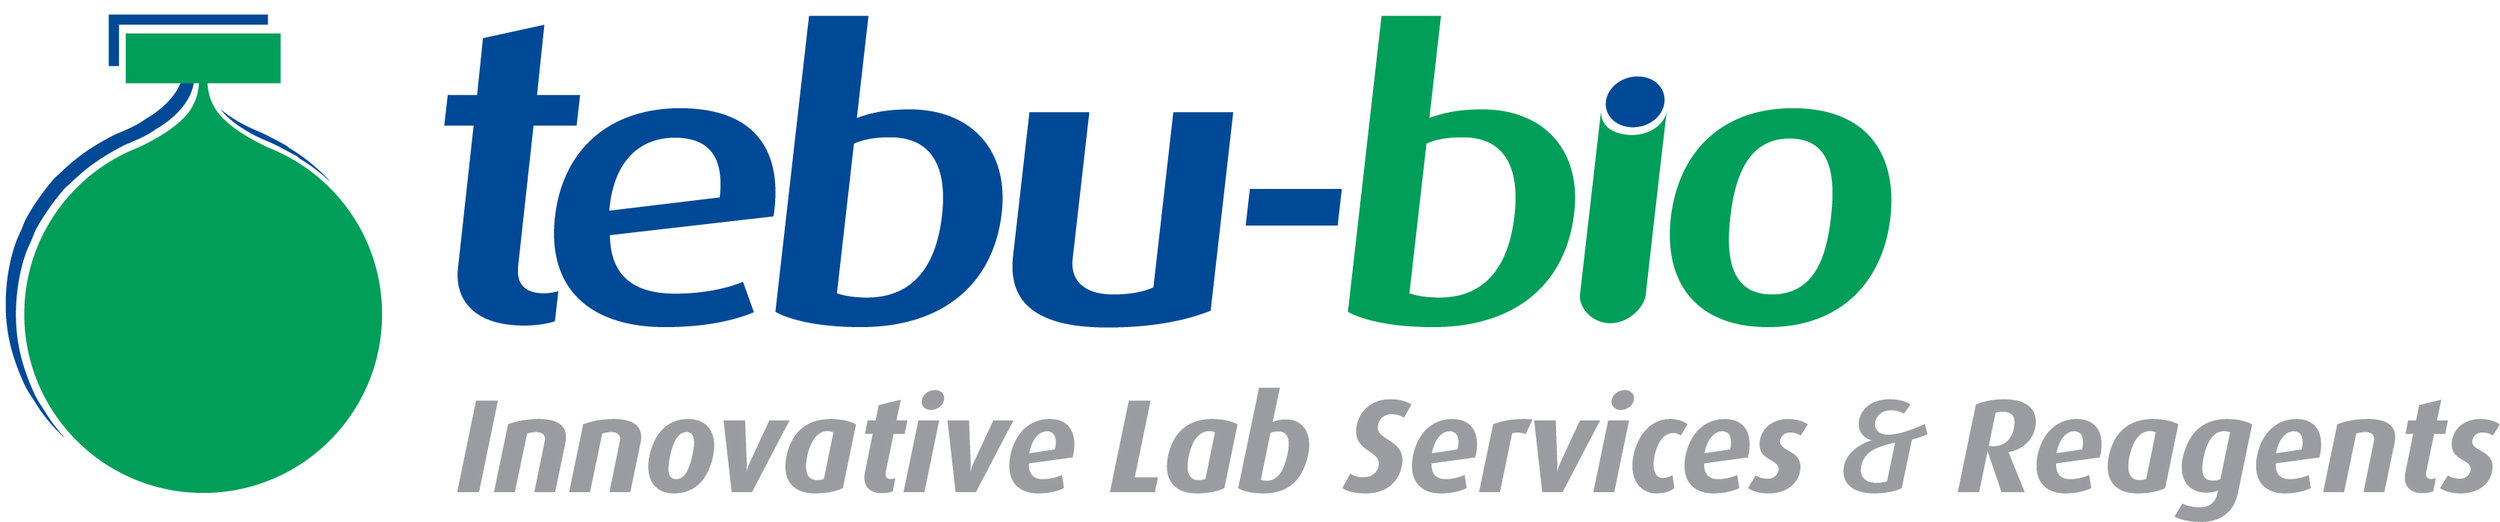 tebu-bio UK & Ireland - Unit 7 – Flag Business ExchangeVicarage Farm RoadPeterboroughCambs PE1 5TXUnited KingdomTel: +44 (0)1733 421880Fax: +44 (0)1733 421882Website: www.tebu-bio.com